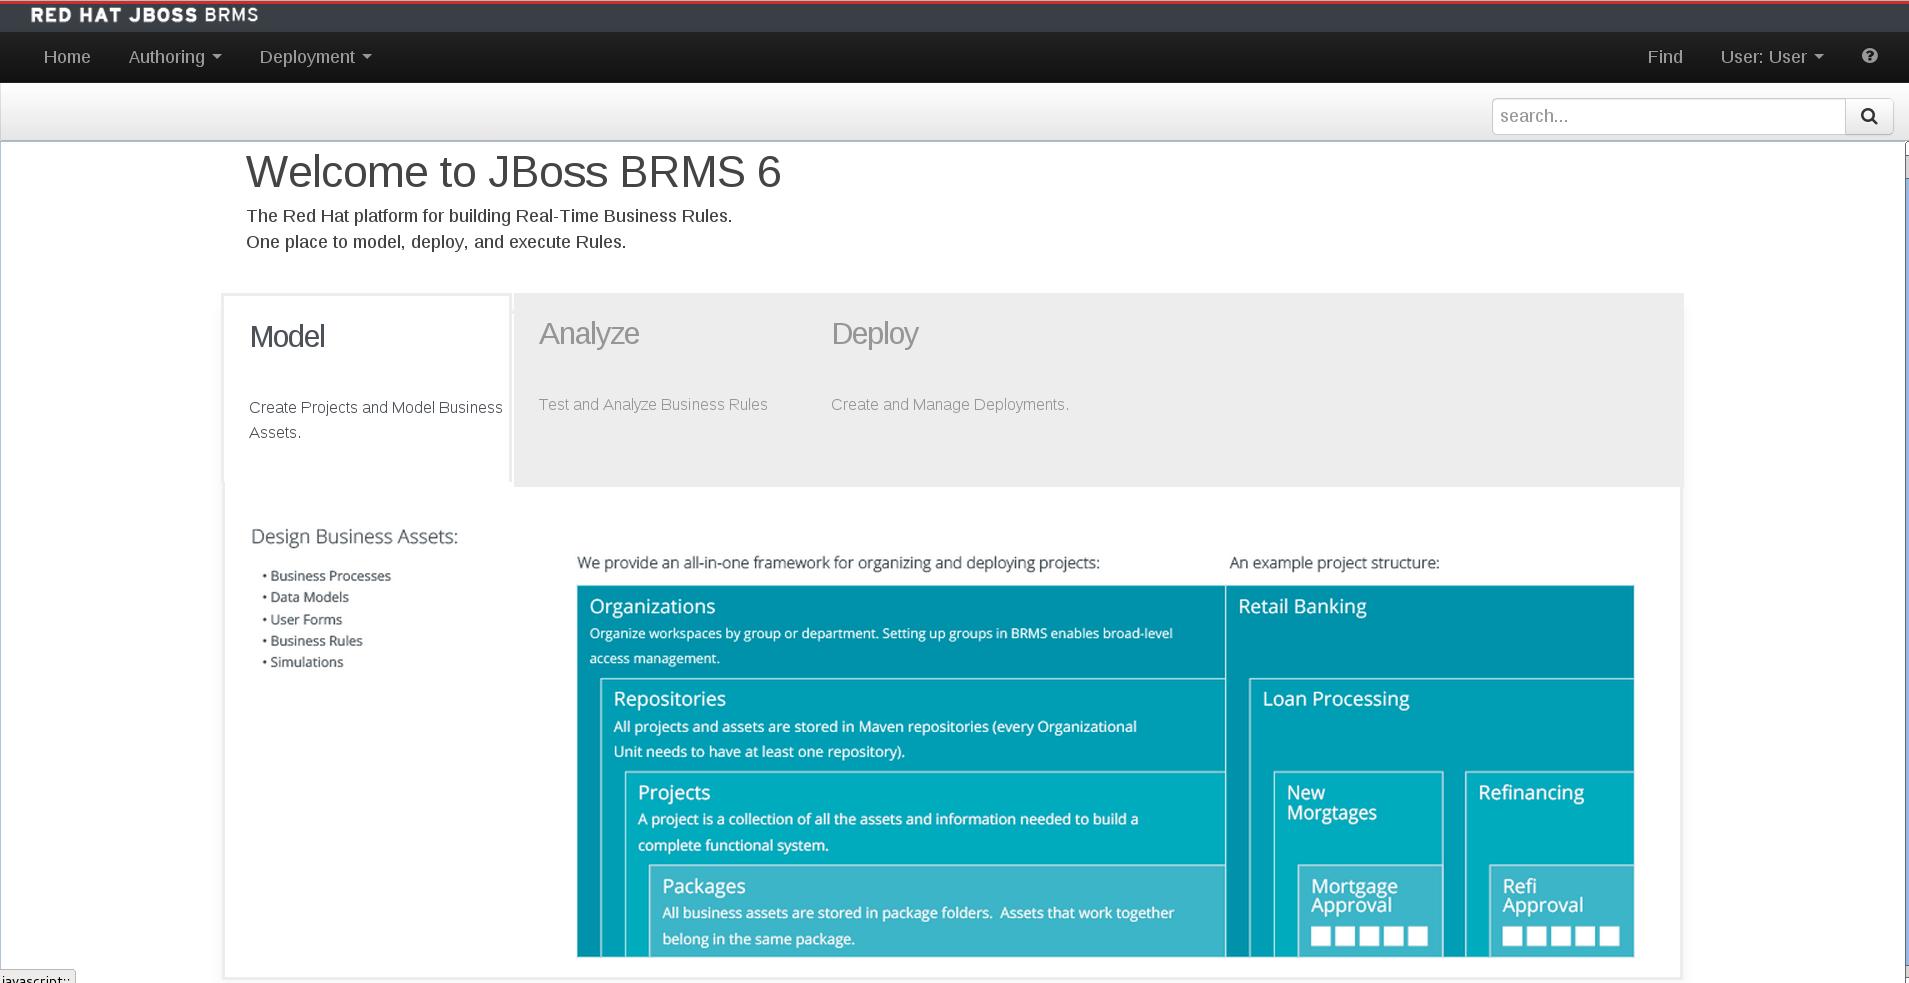 A screenshot of the BRMS Home Screen